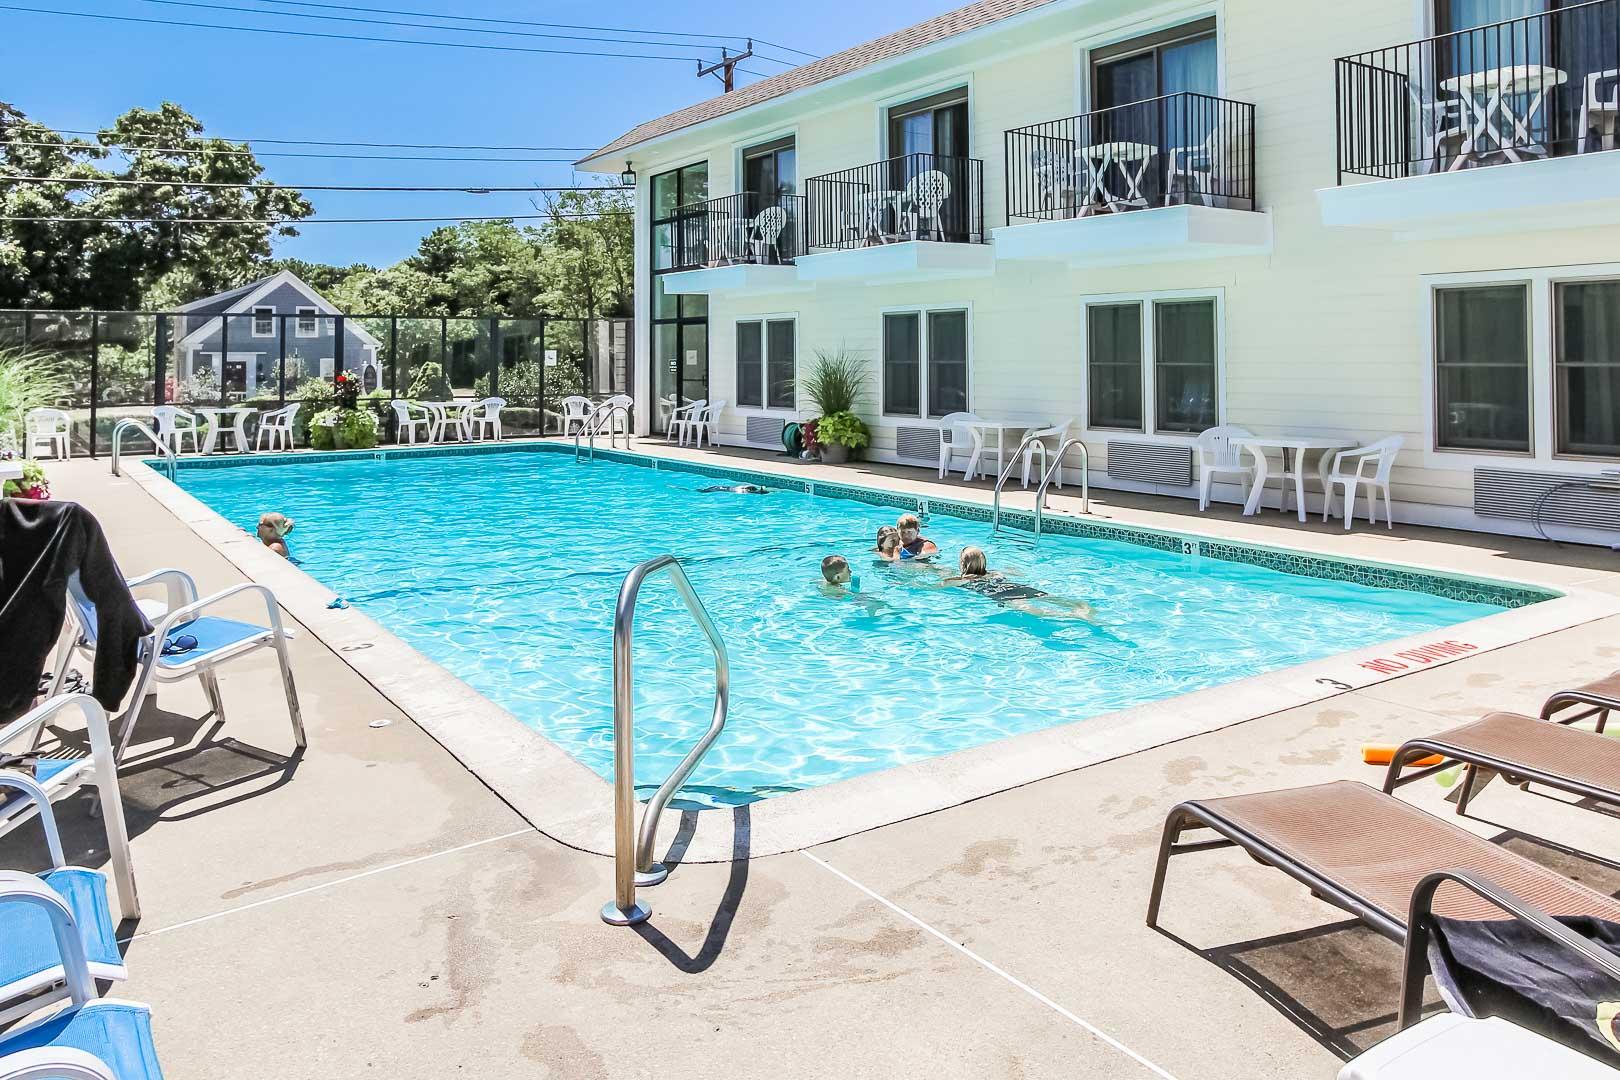 A crisp pool at Holly Tree Resort at Massachusetts.